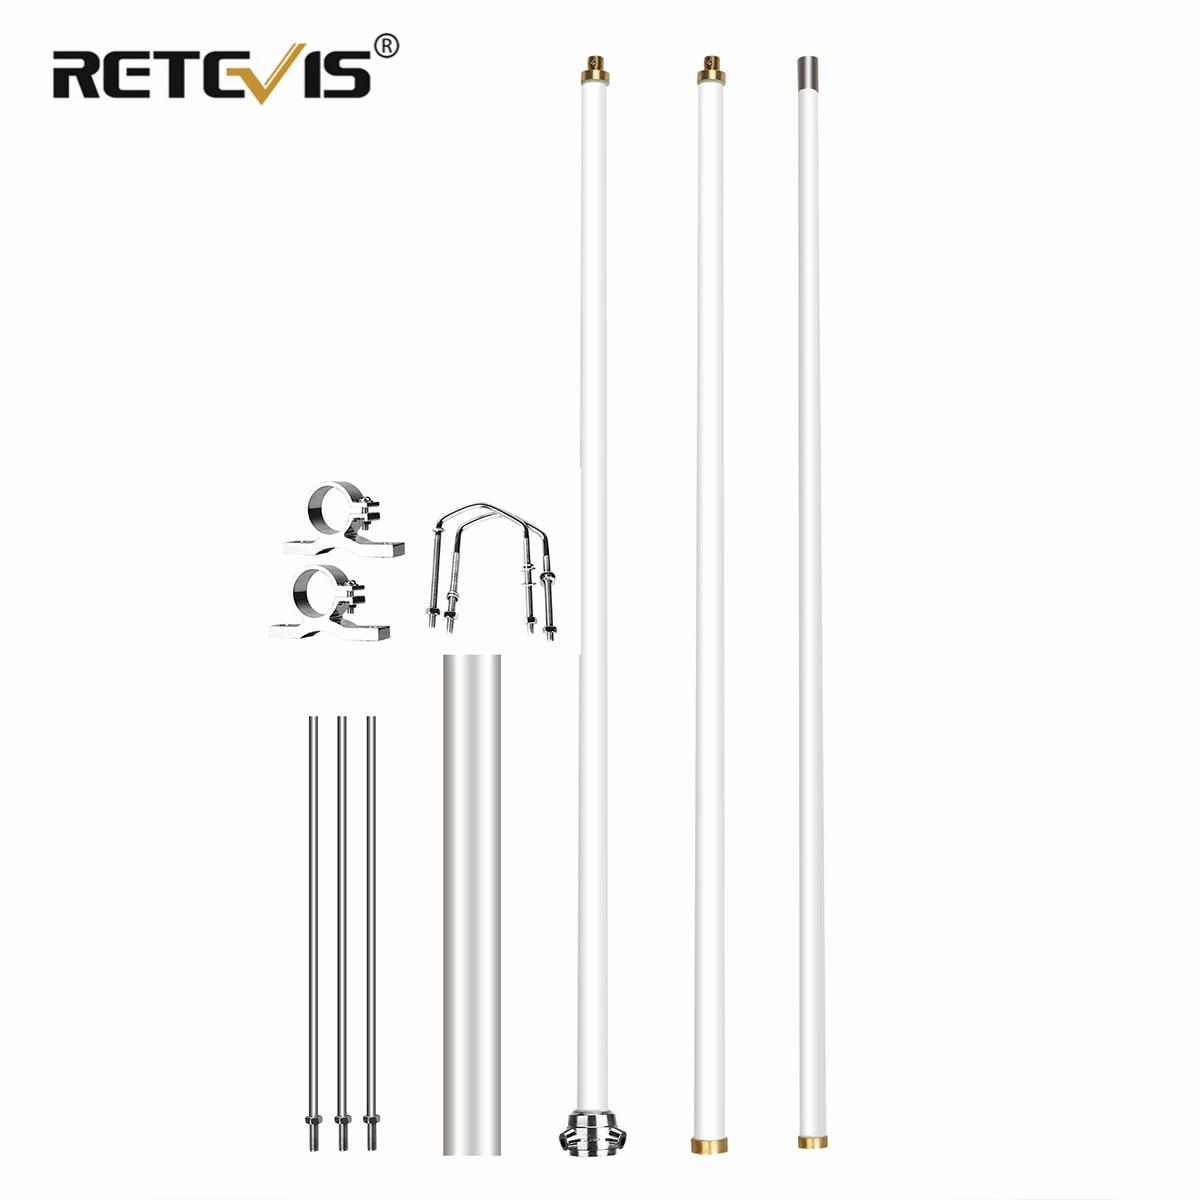 RETEVIS MA05 High Gain Glass Steel Omni-Directional Antenna VHF UHF SL16-K For Base Station For Repeater Retevis RT97/RT92/RT74